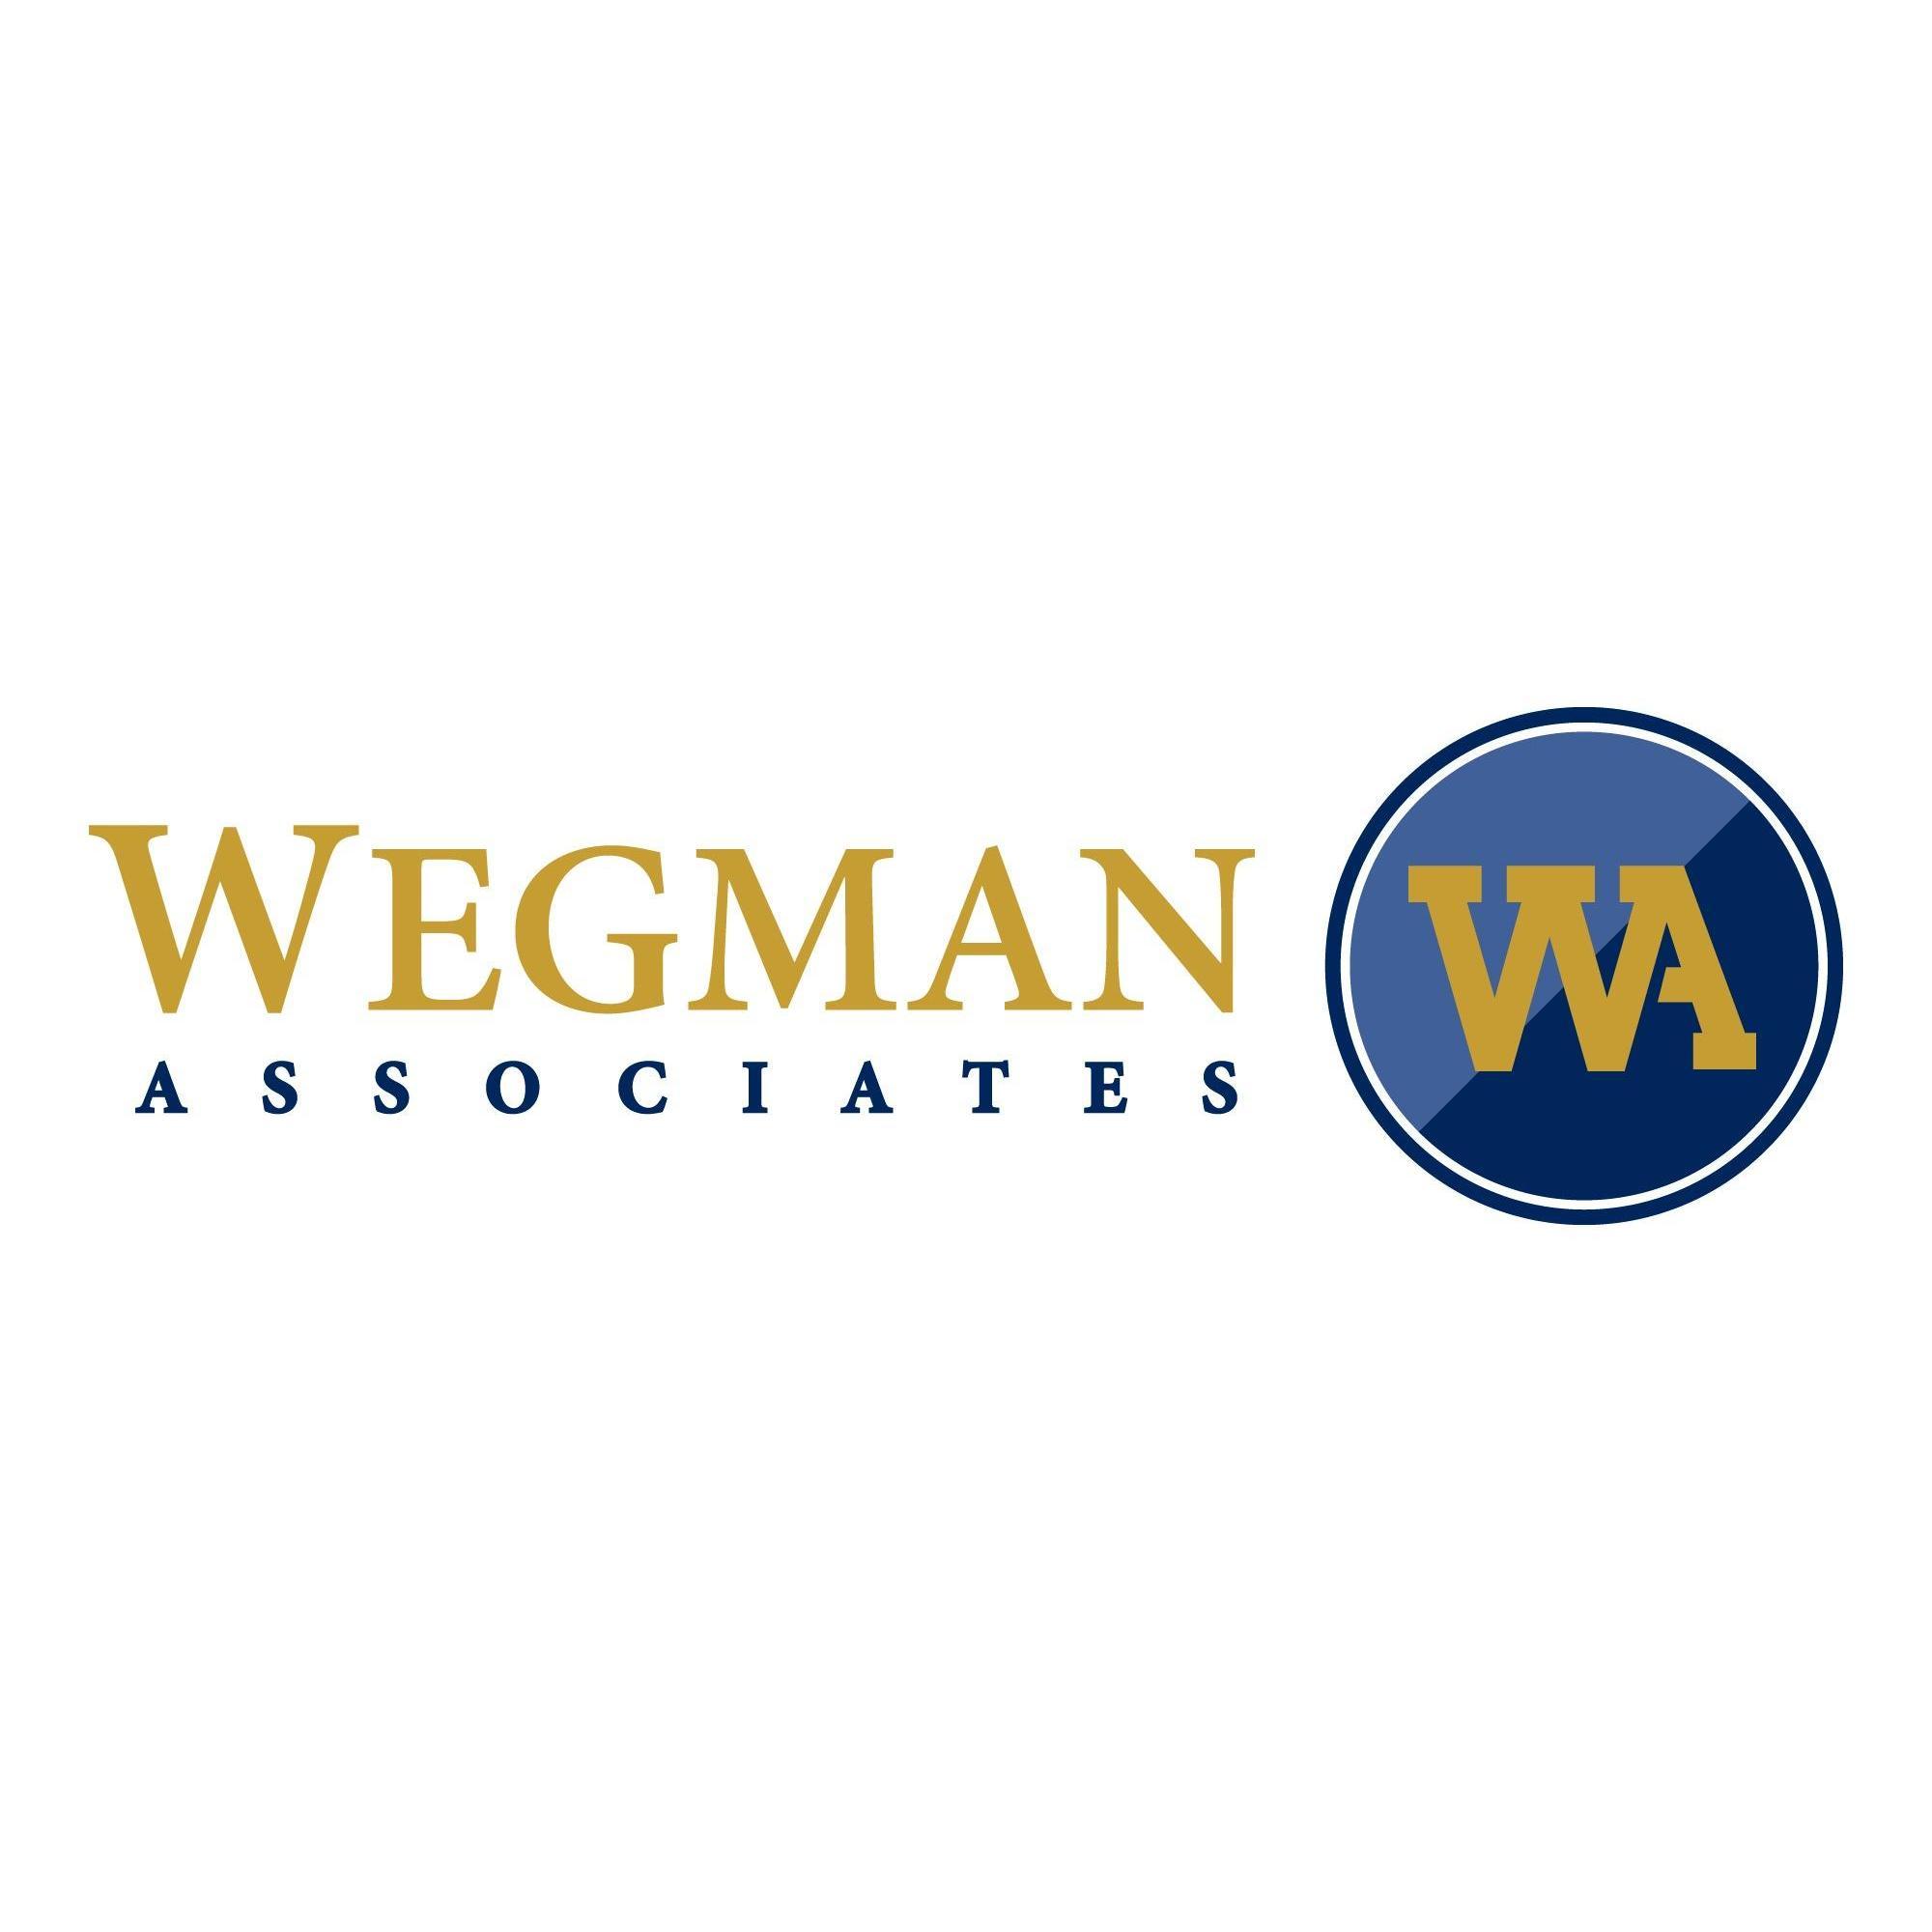 Wegman Associates - Medley, FL 33178 - (800)884-6860 | ShowMeLocal.com